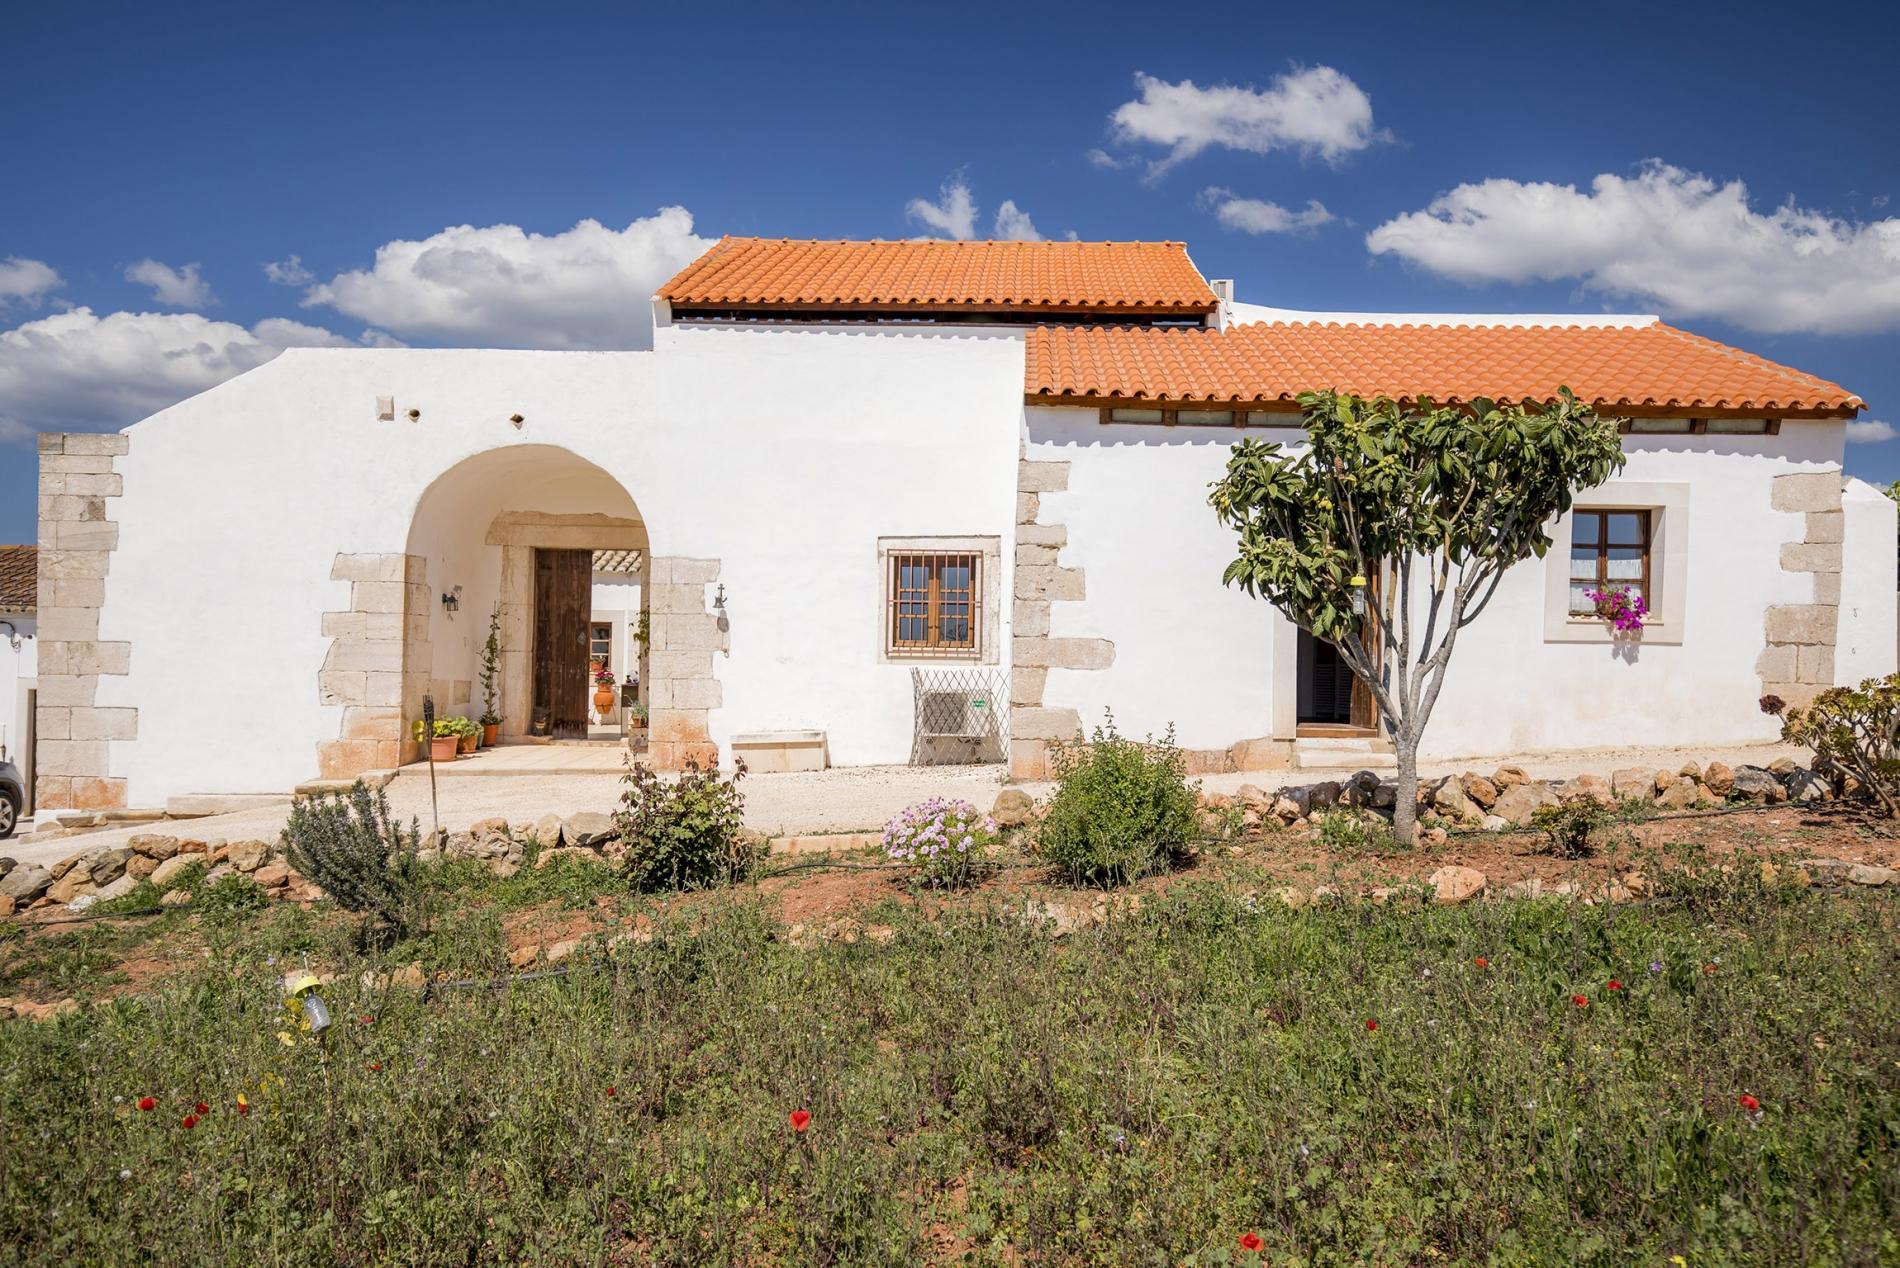 Apartment F - Casa do Garibaldi in Quinta das Alagoas photo 22521339